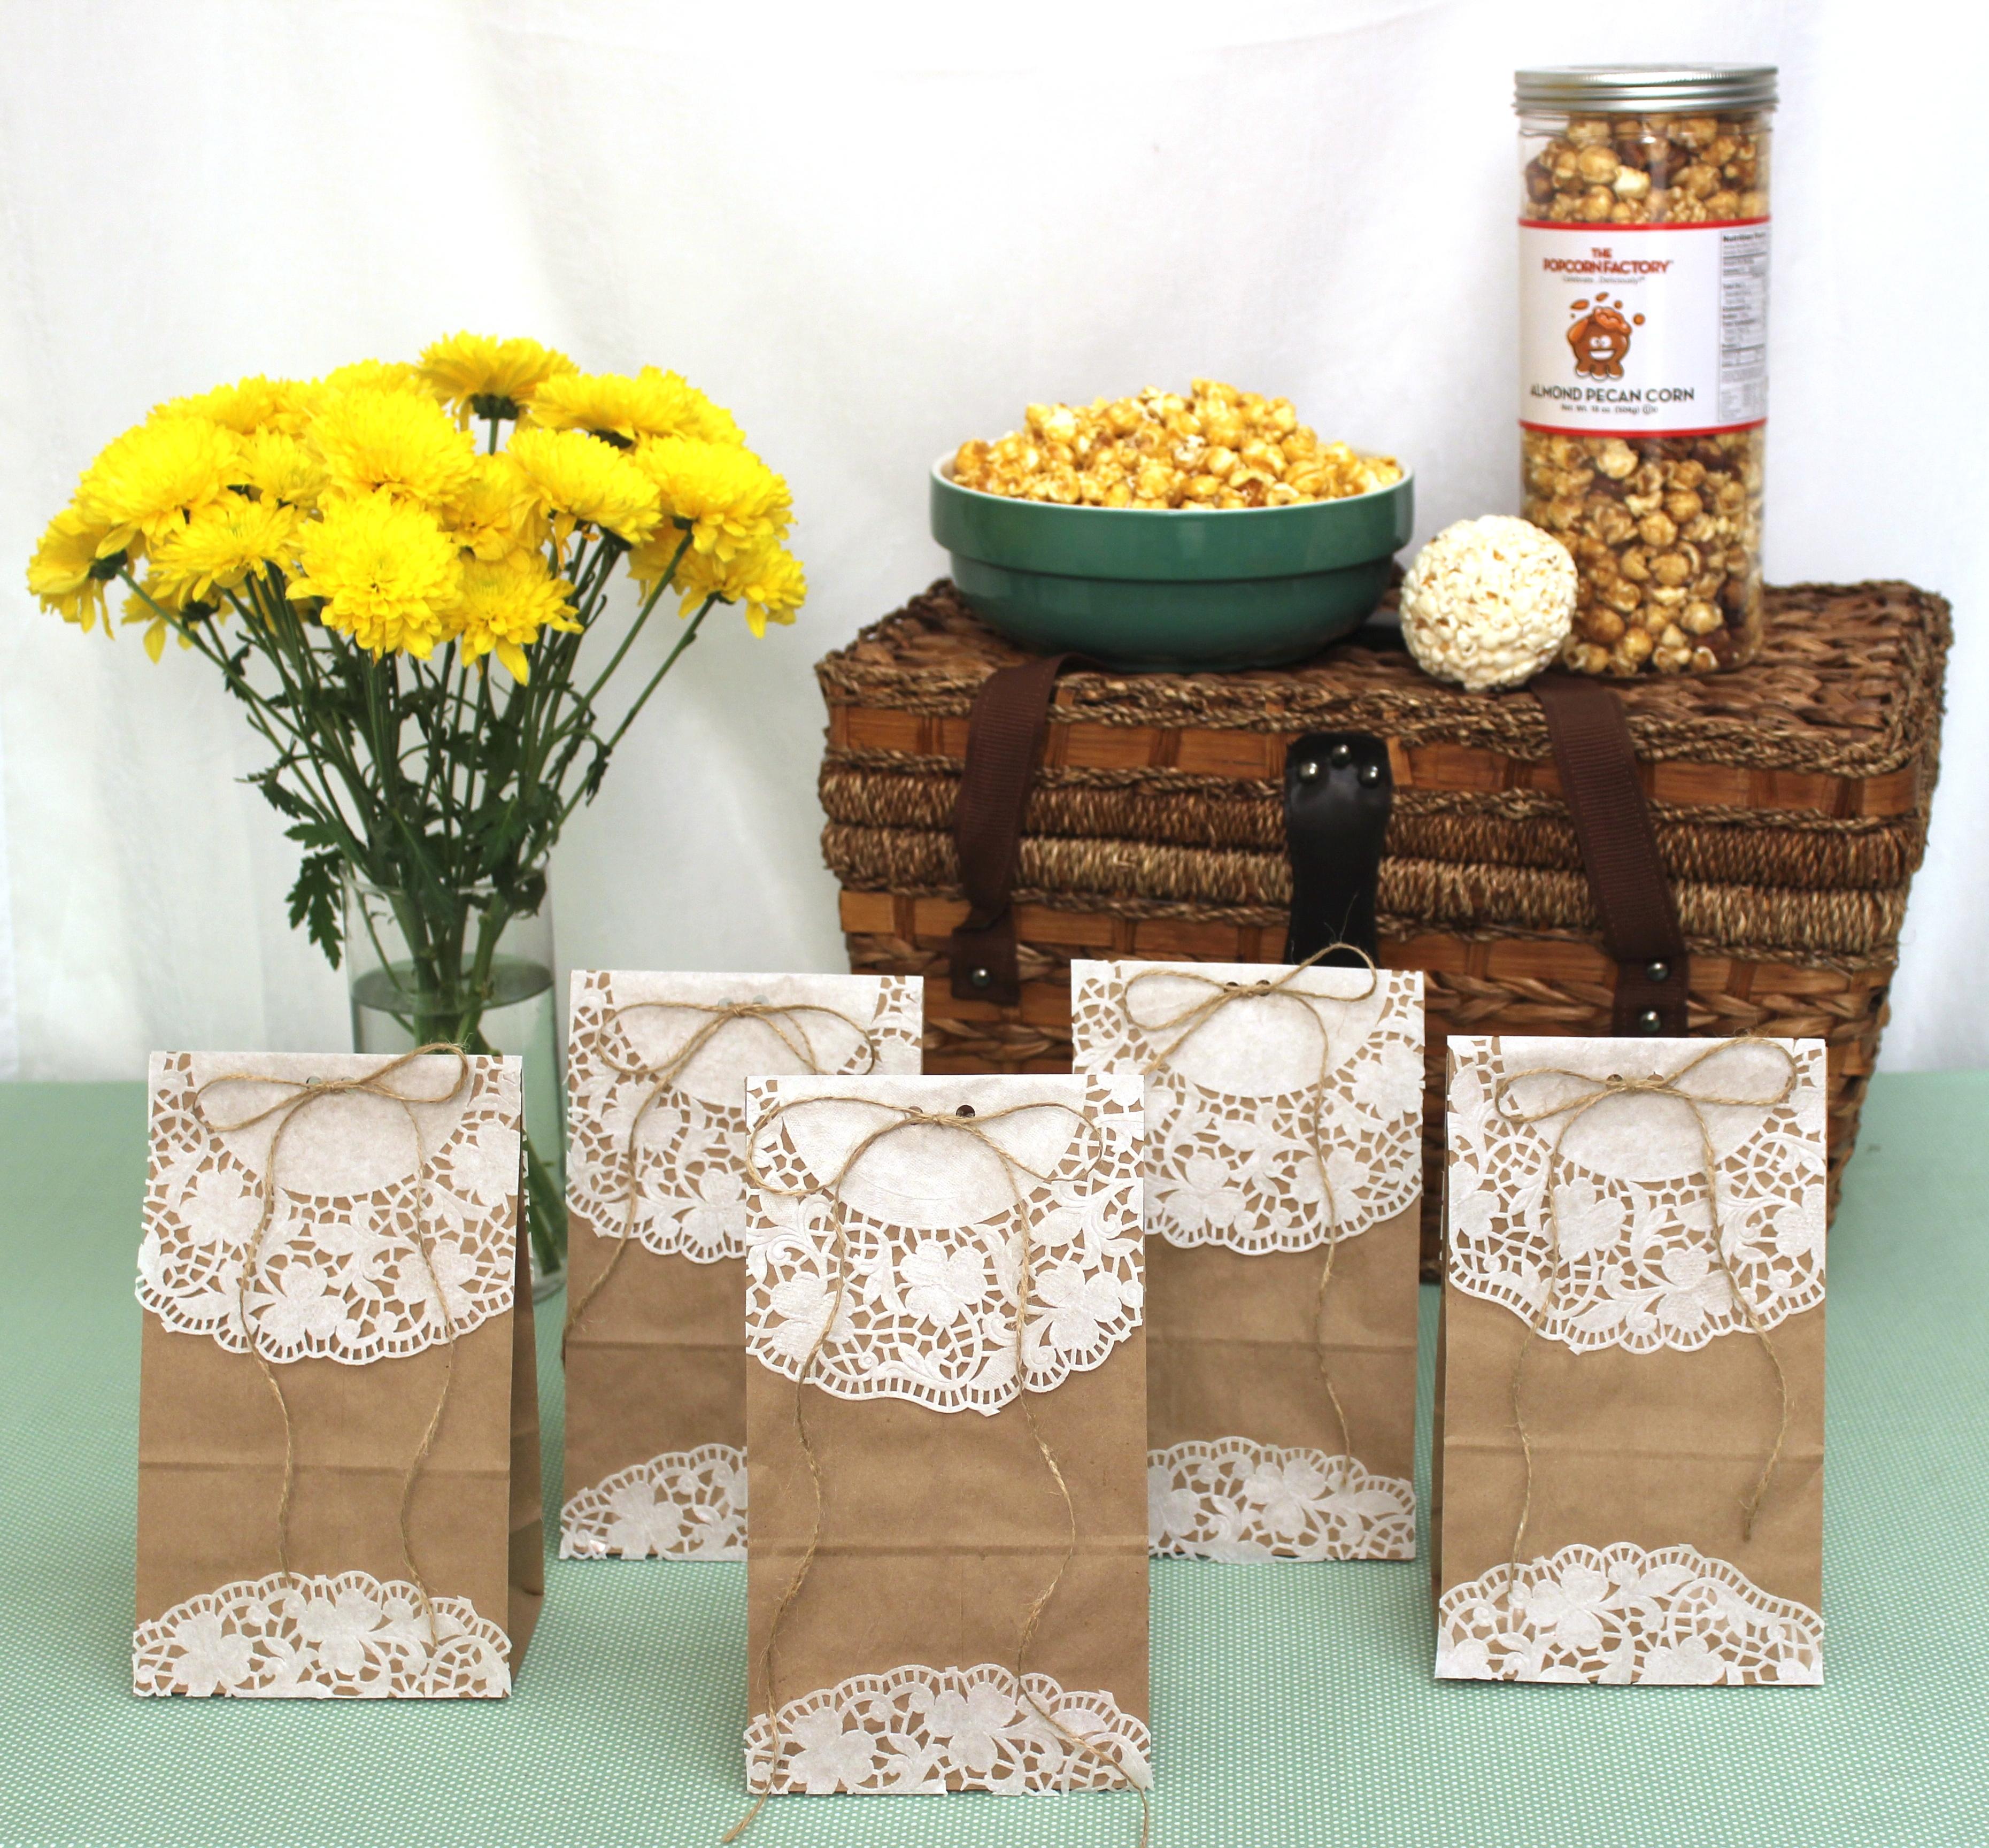 Bag Microwave Popcorn Diy Popcorn Goody Bags